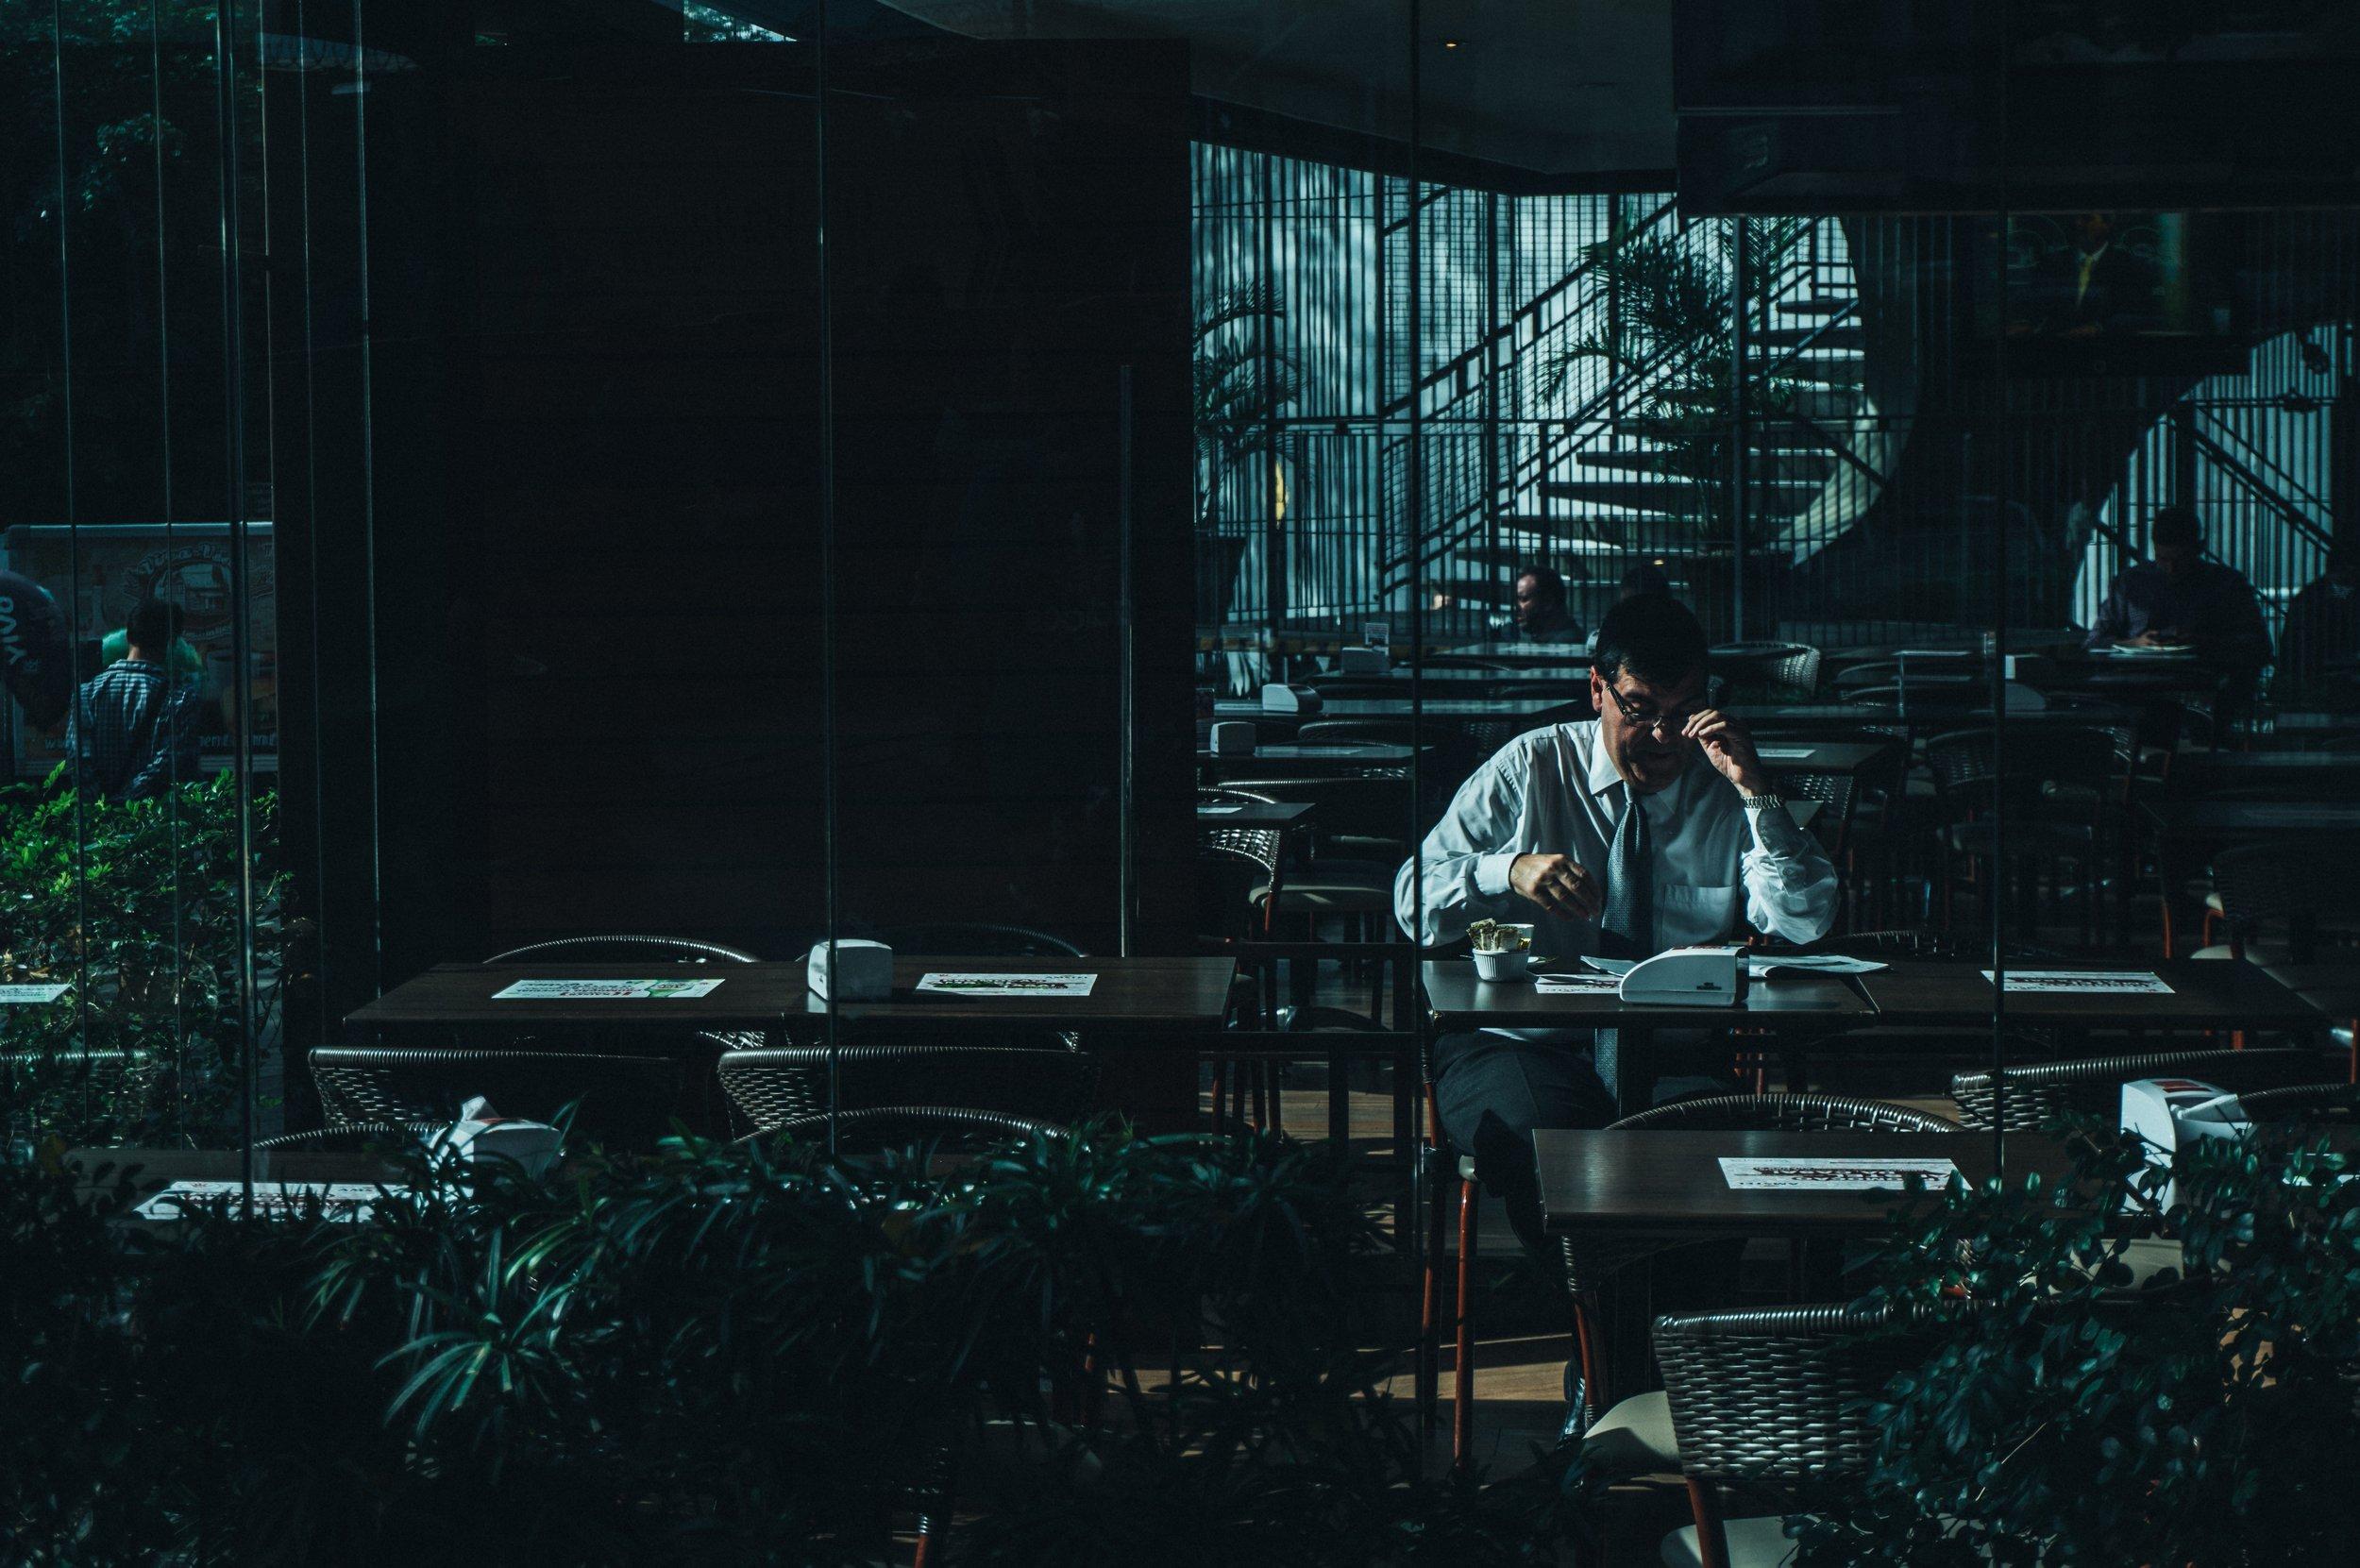 negative-space-man-desk-working-office-night-kaique-rocha.jpg